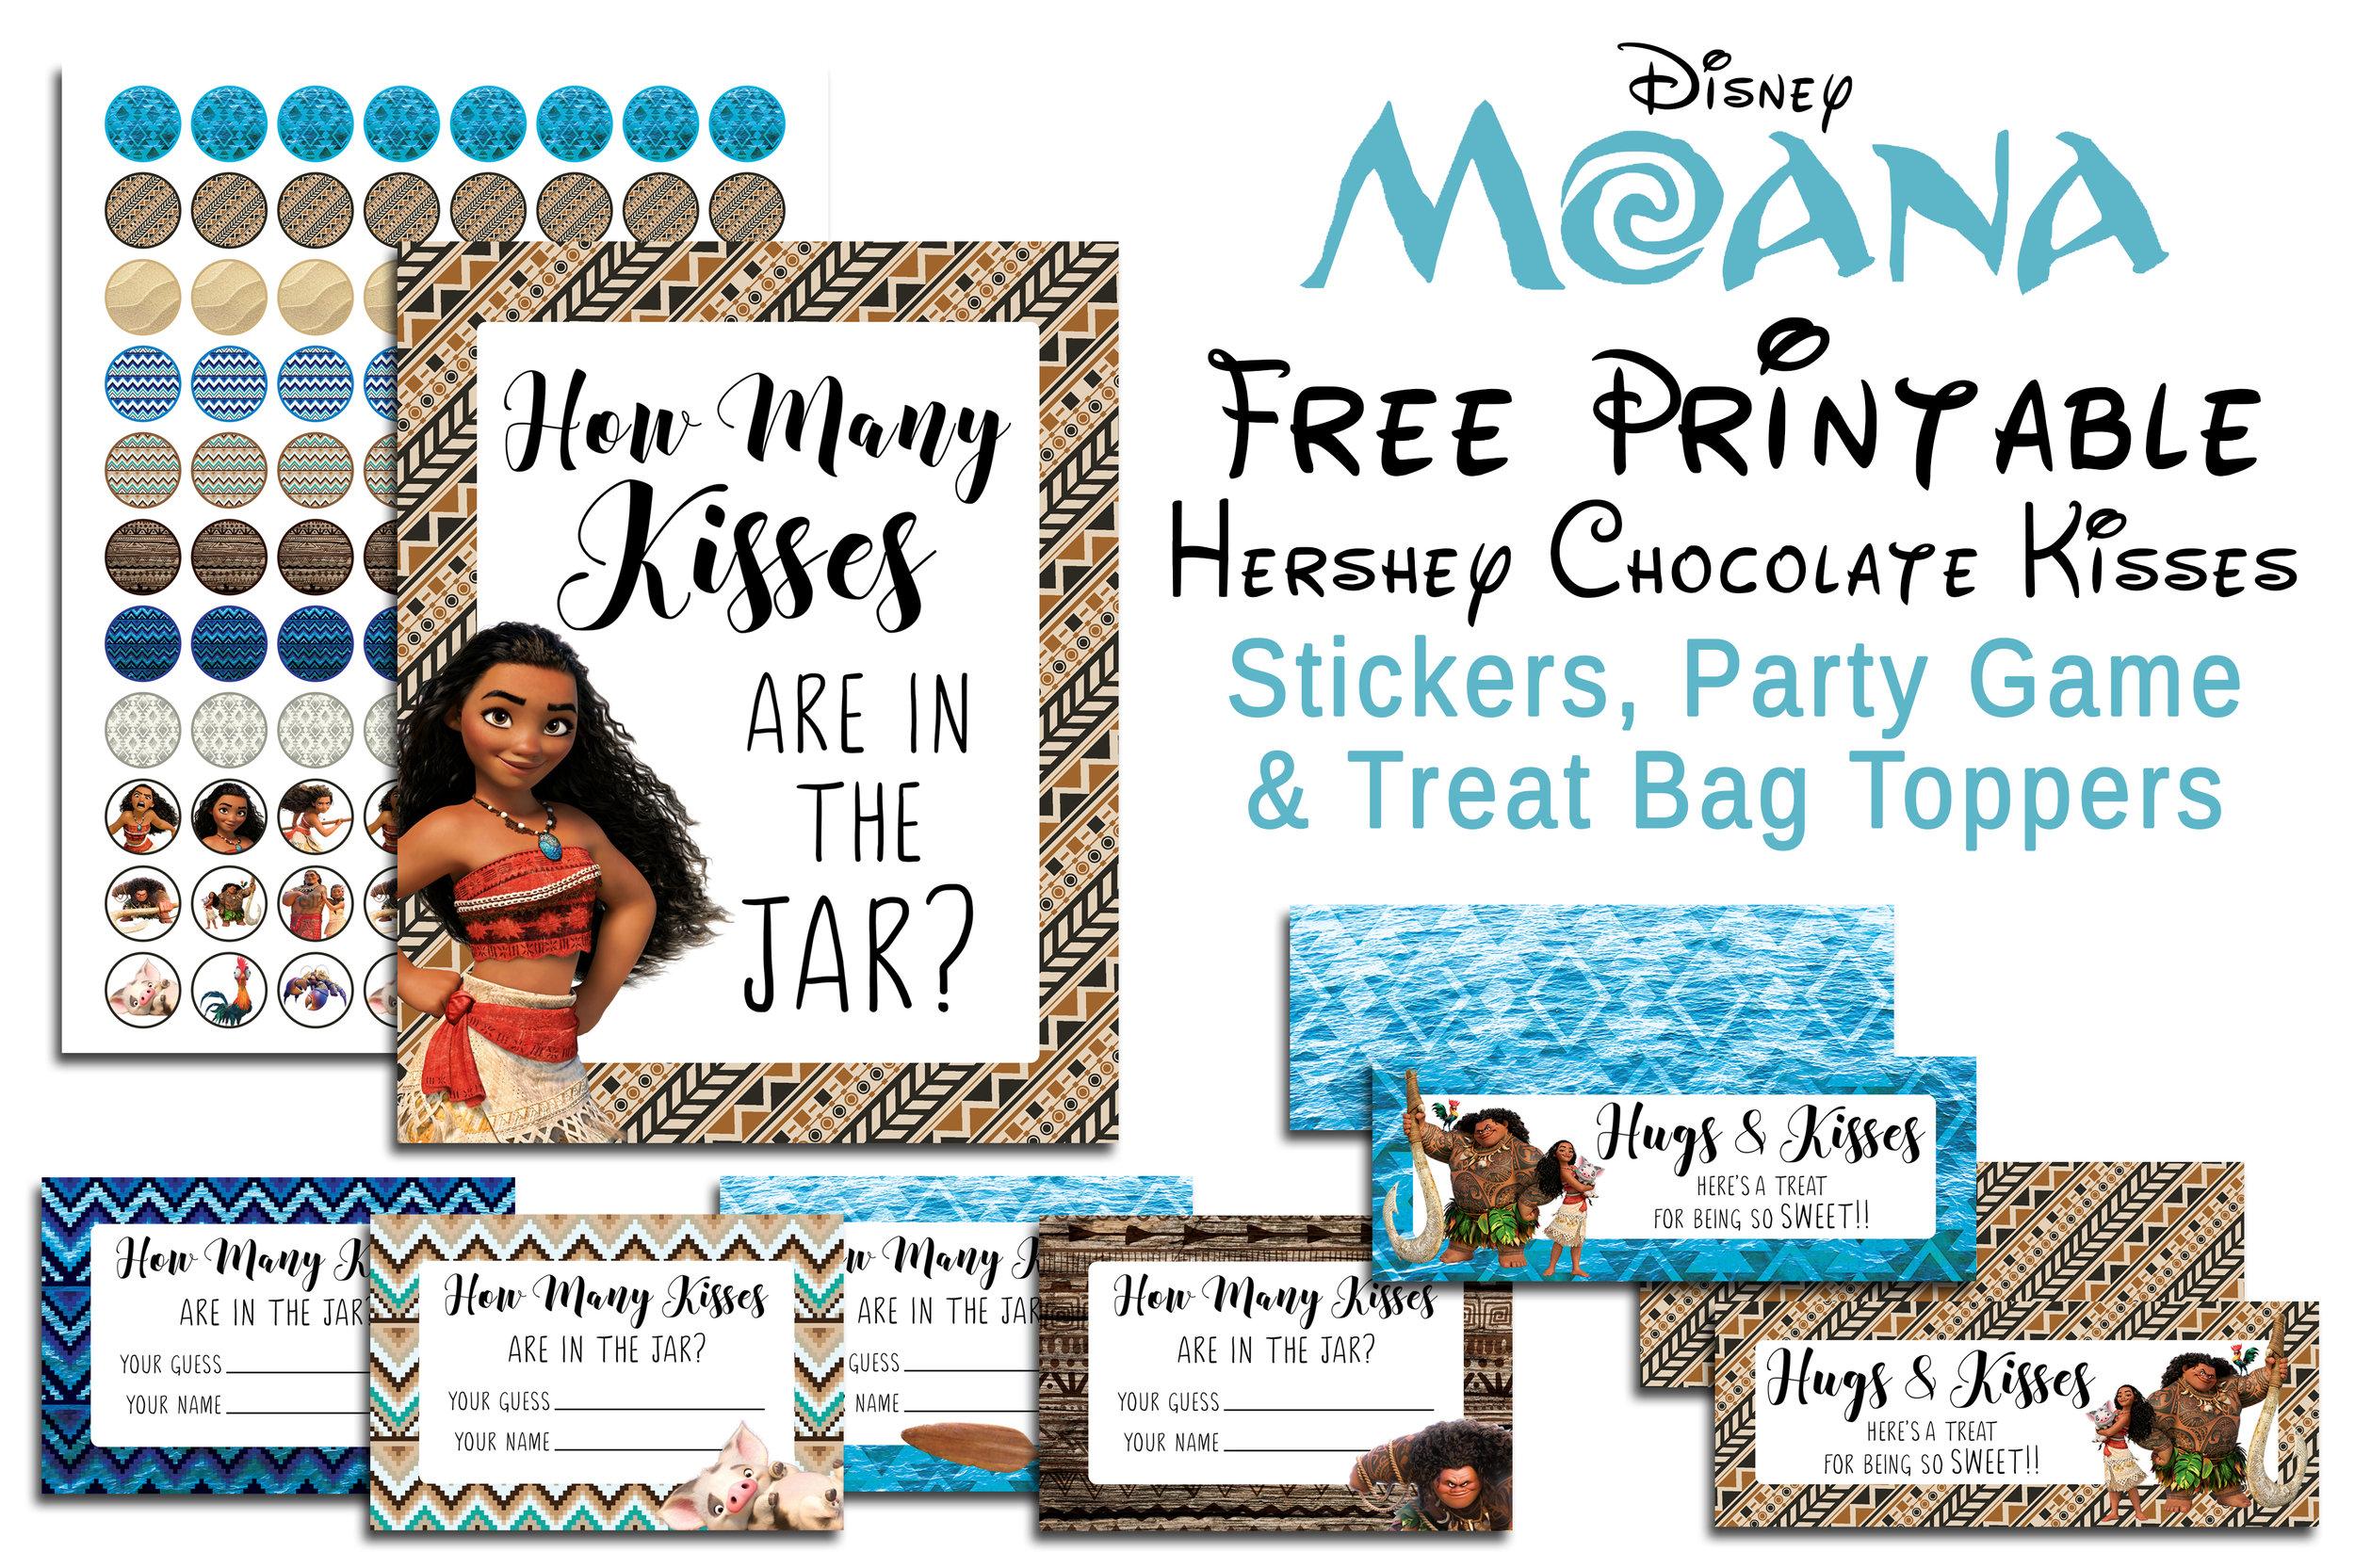 disney moana free printable hershey